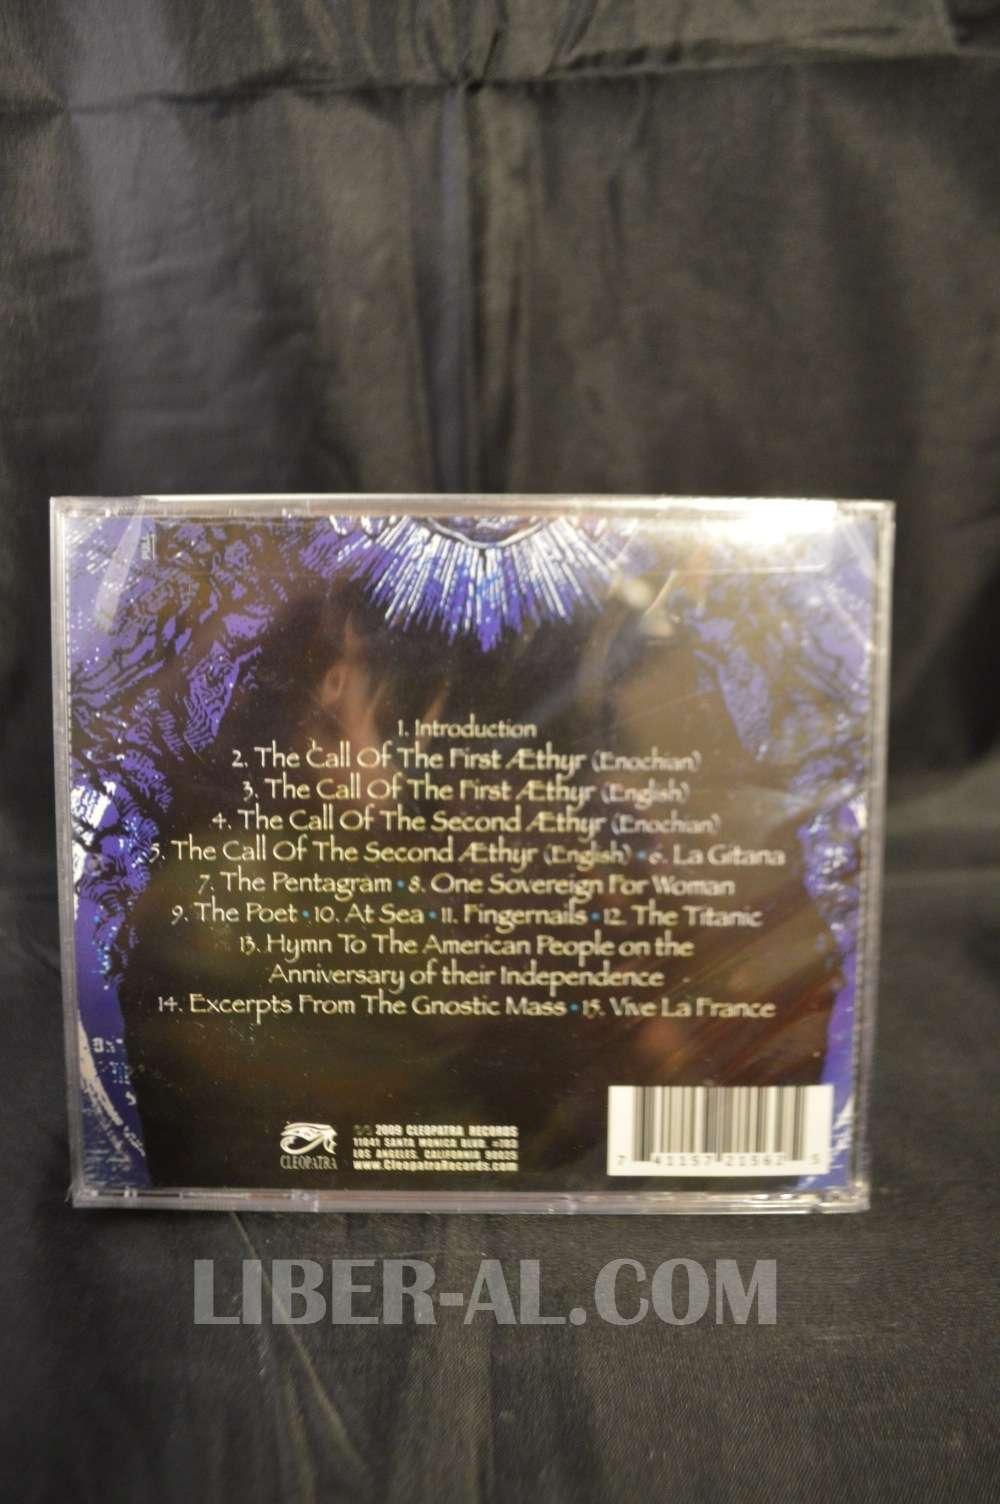 ALEISTER CROWLEY: 1910-1914 BLACK MAGIC RECORDINGS (CD)